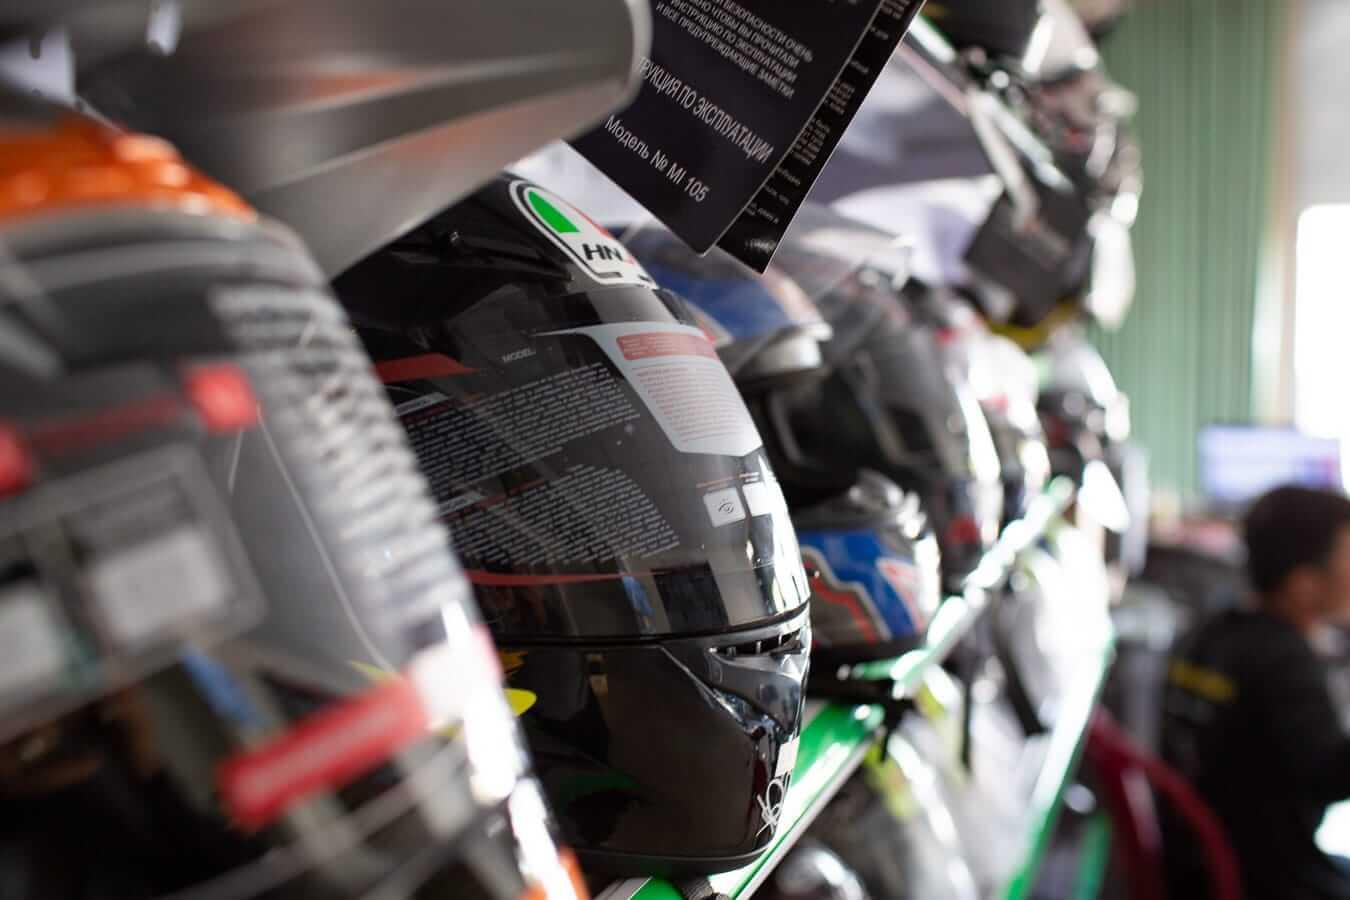 Motorbike Rental Shops in Hoi An - Hidden Hoian